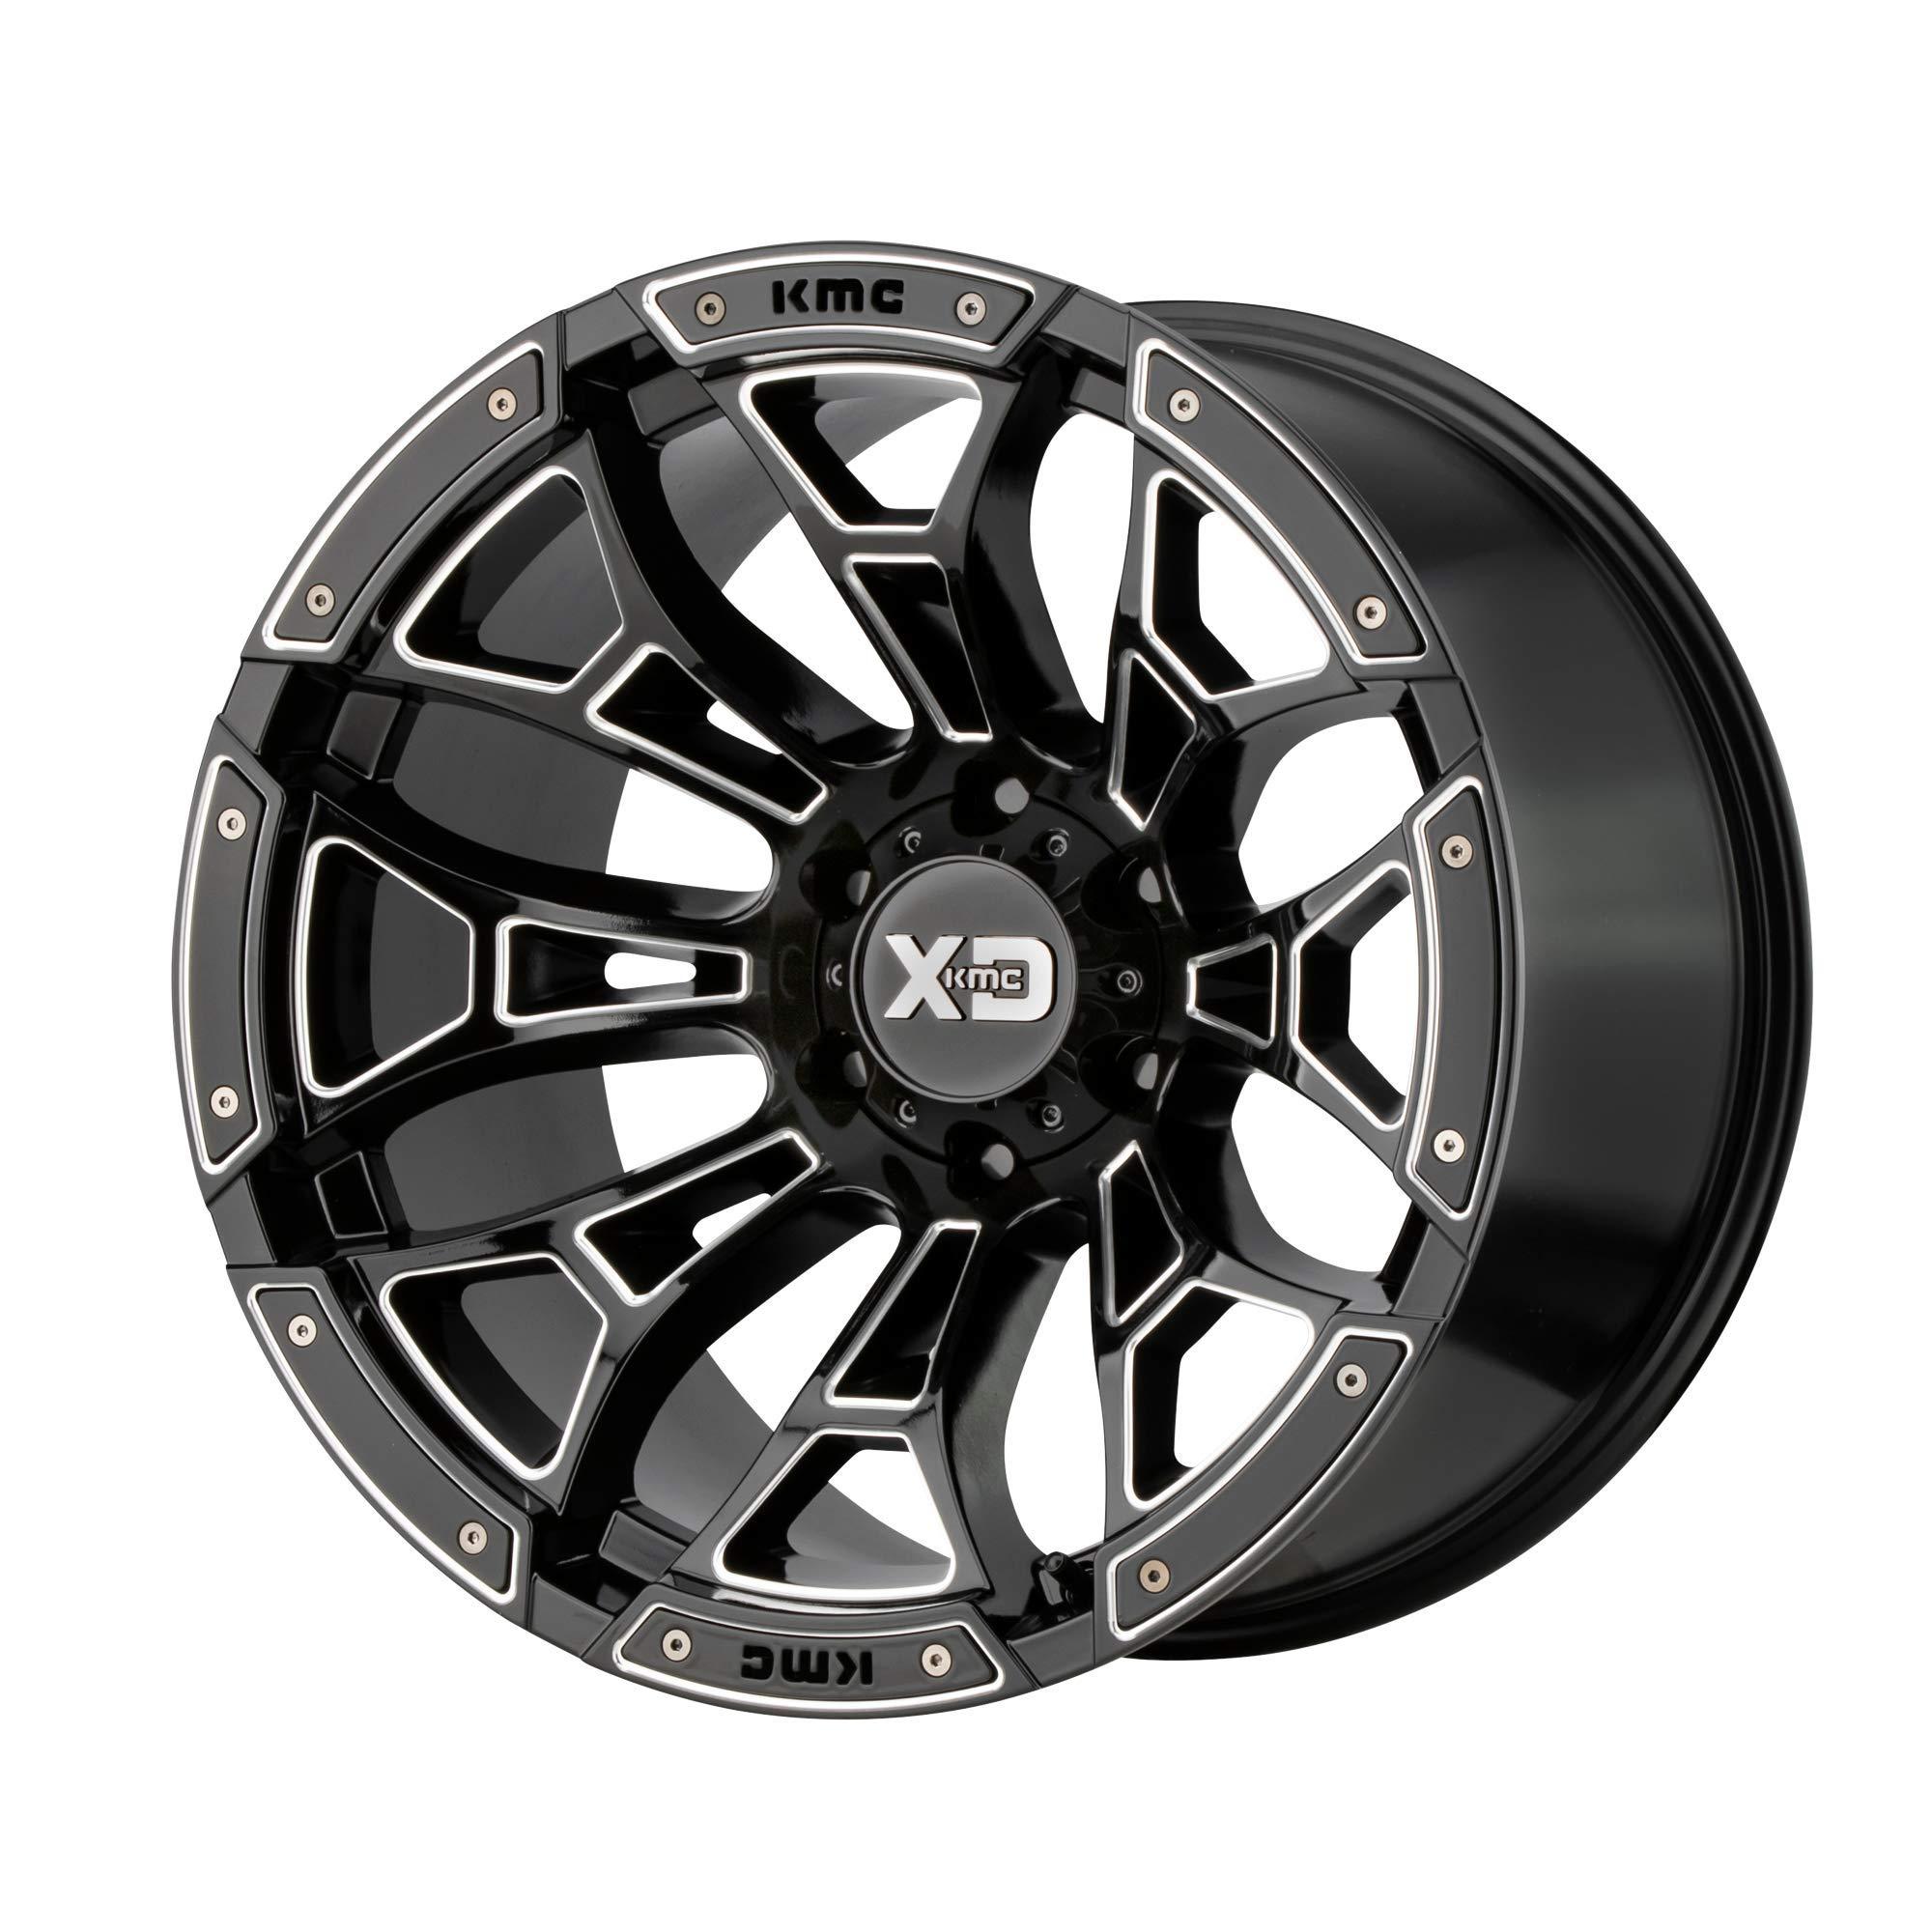 XD Series by KMC Wheels XD841 18X9 6X5.5 G-BLK Mill 00MM AUTO Rim